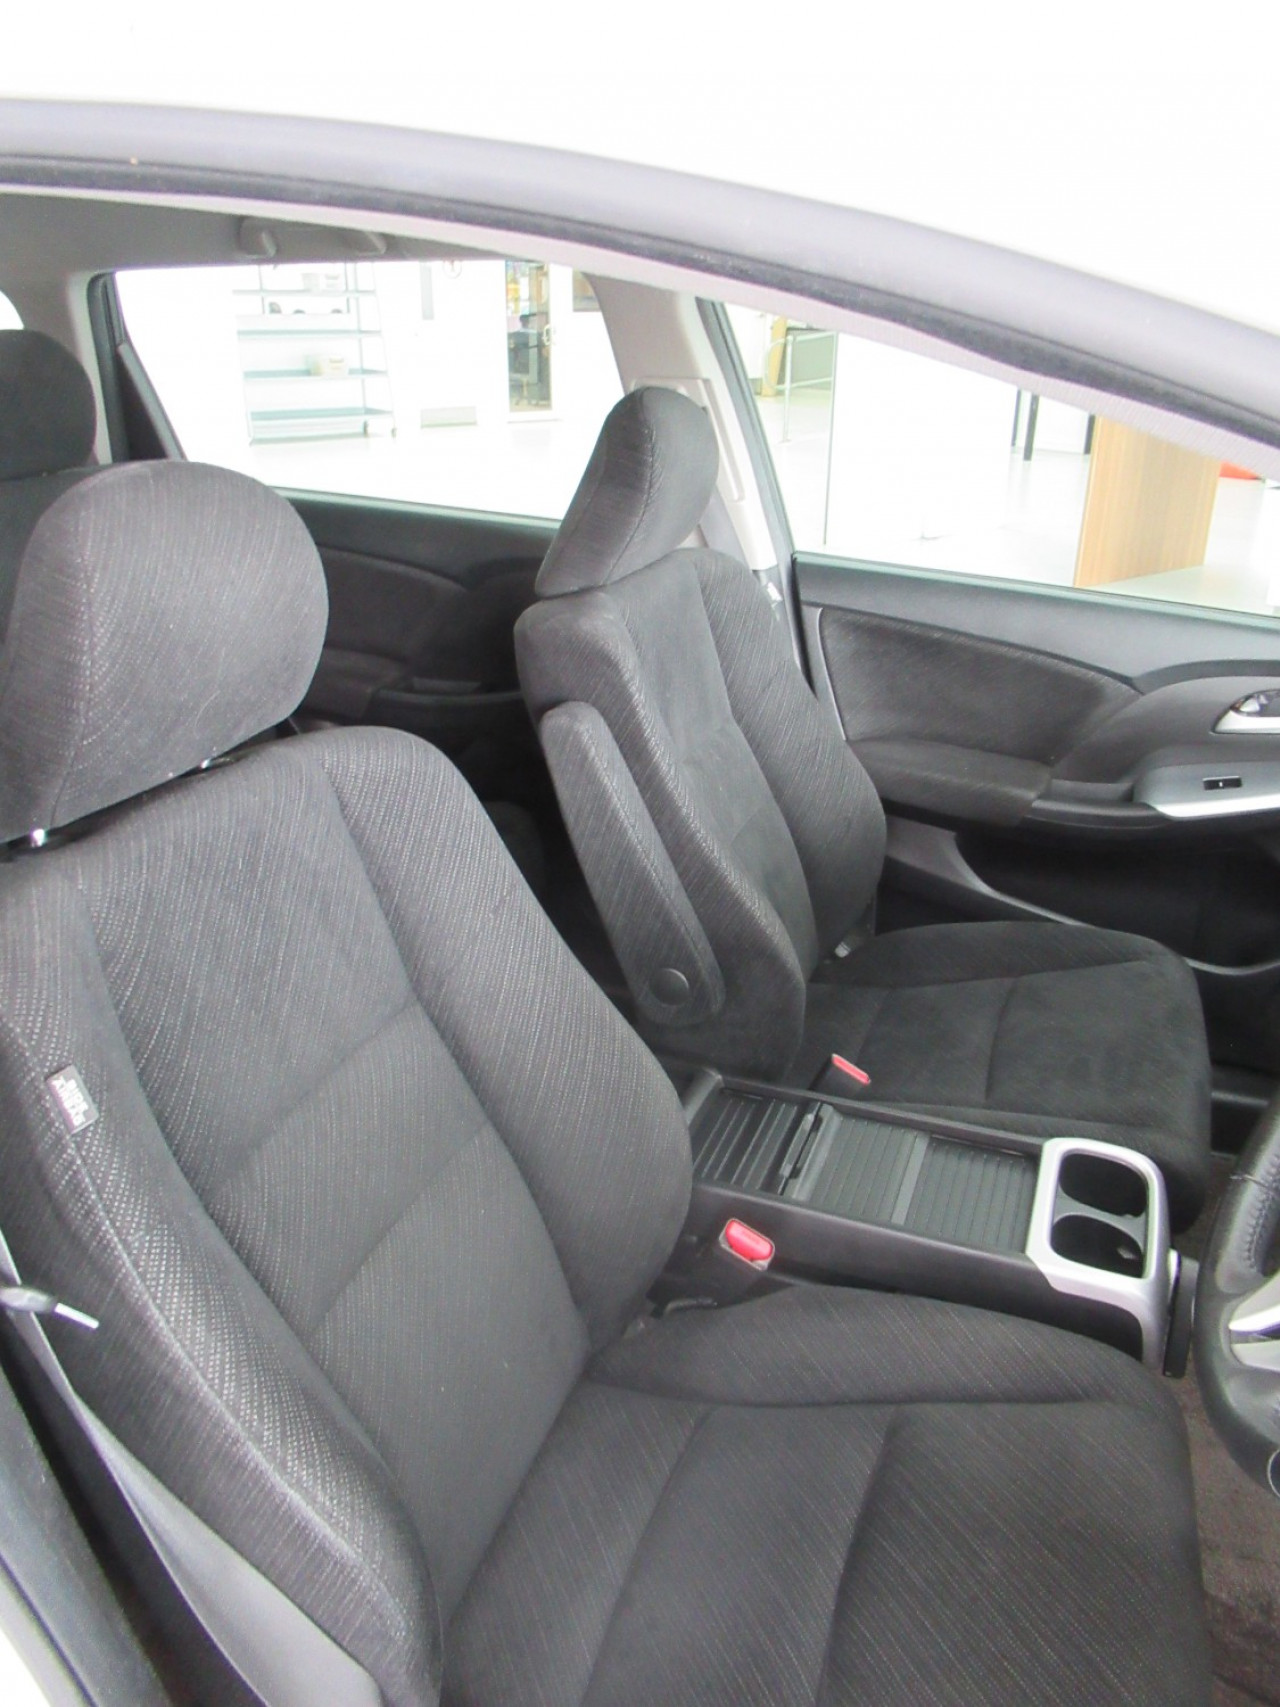 2013 Honda Odyssey 4TH GEN MY13 Wagon Image 14